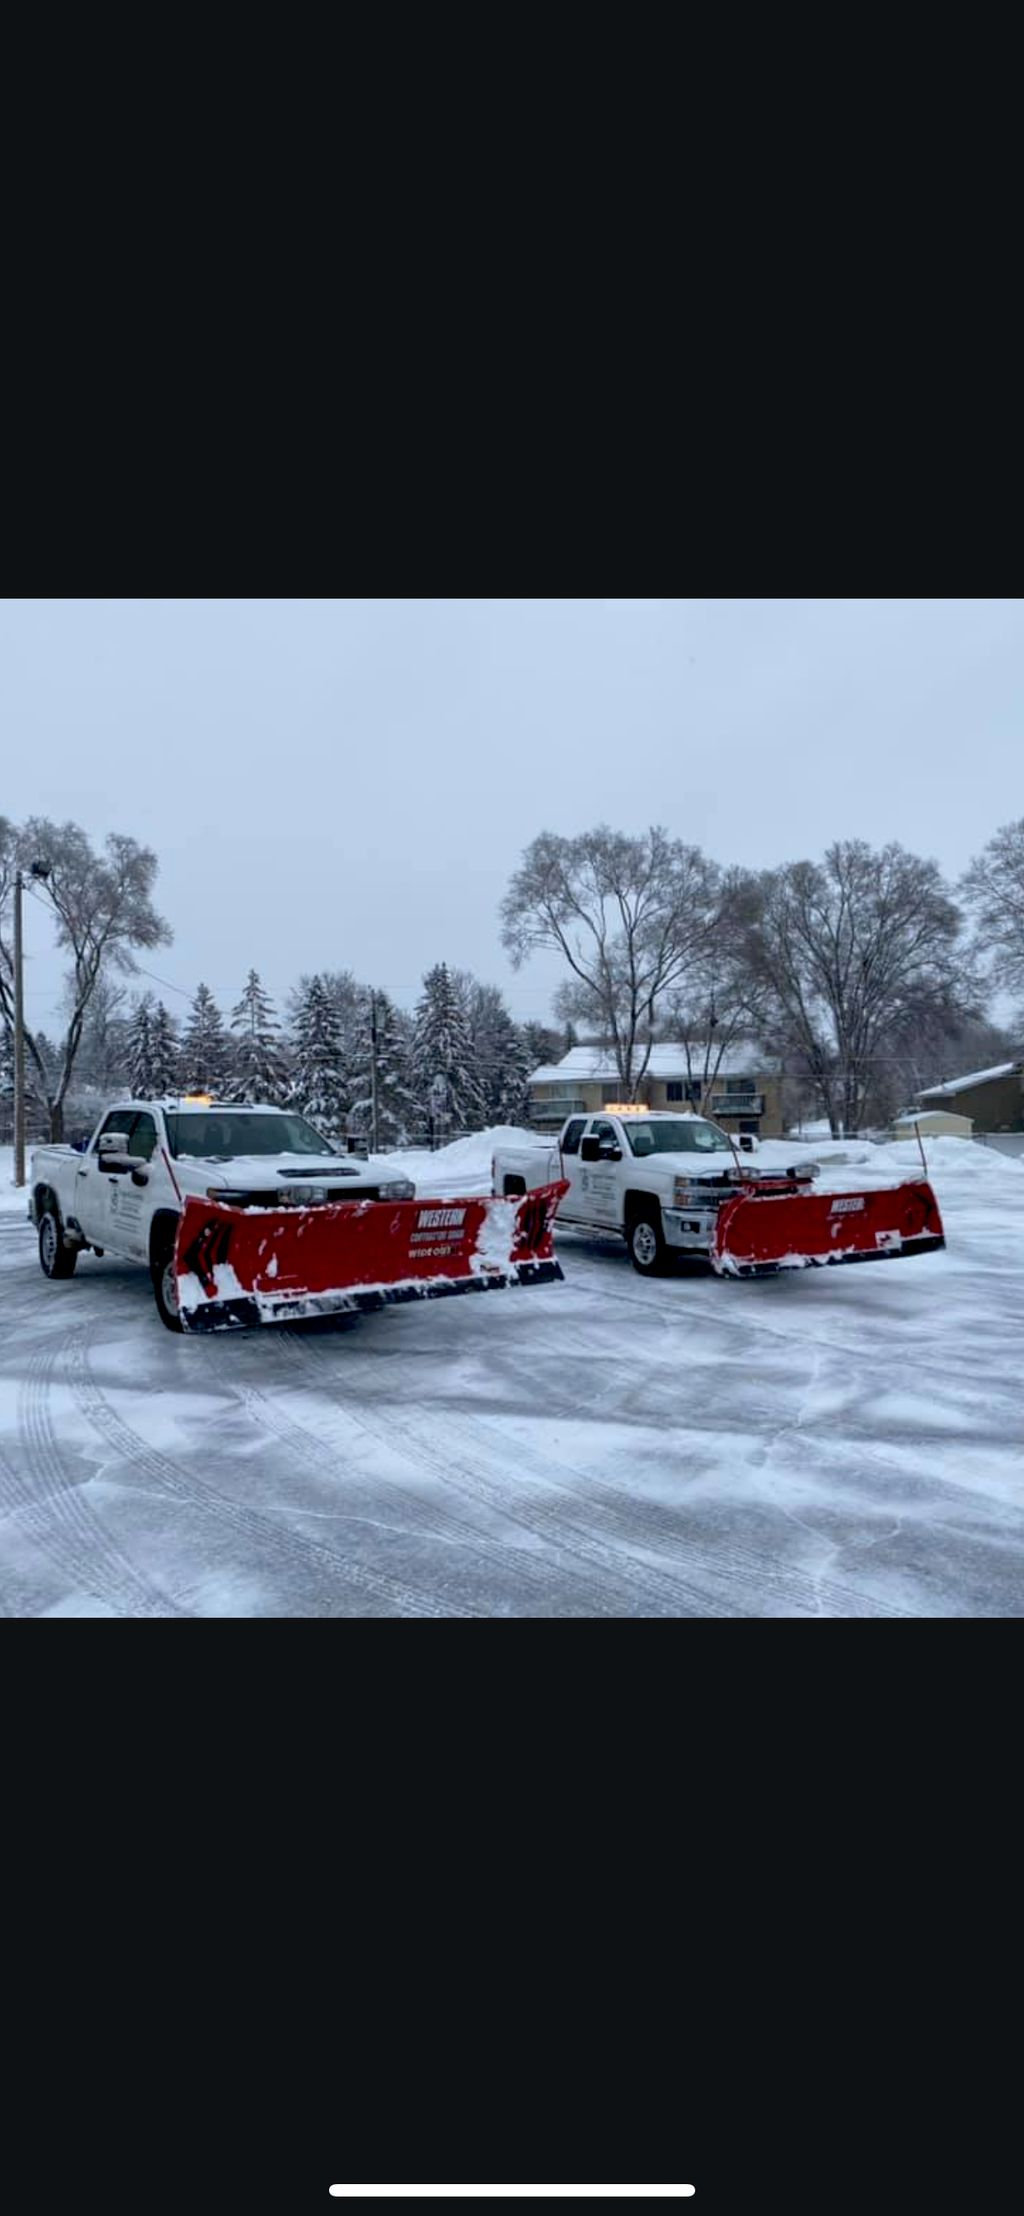 Snow Removal Coon Rapids Minnesota